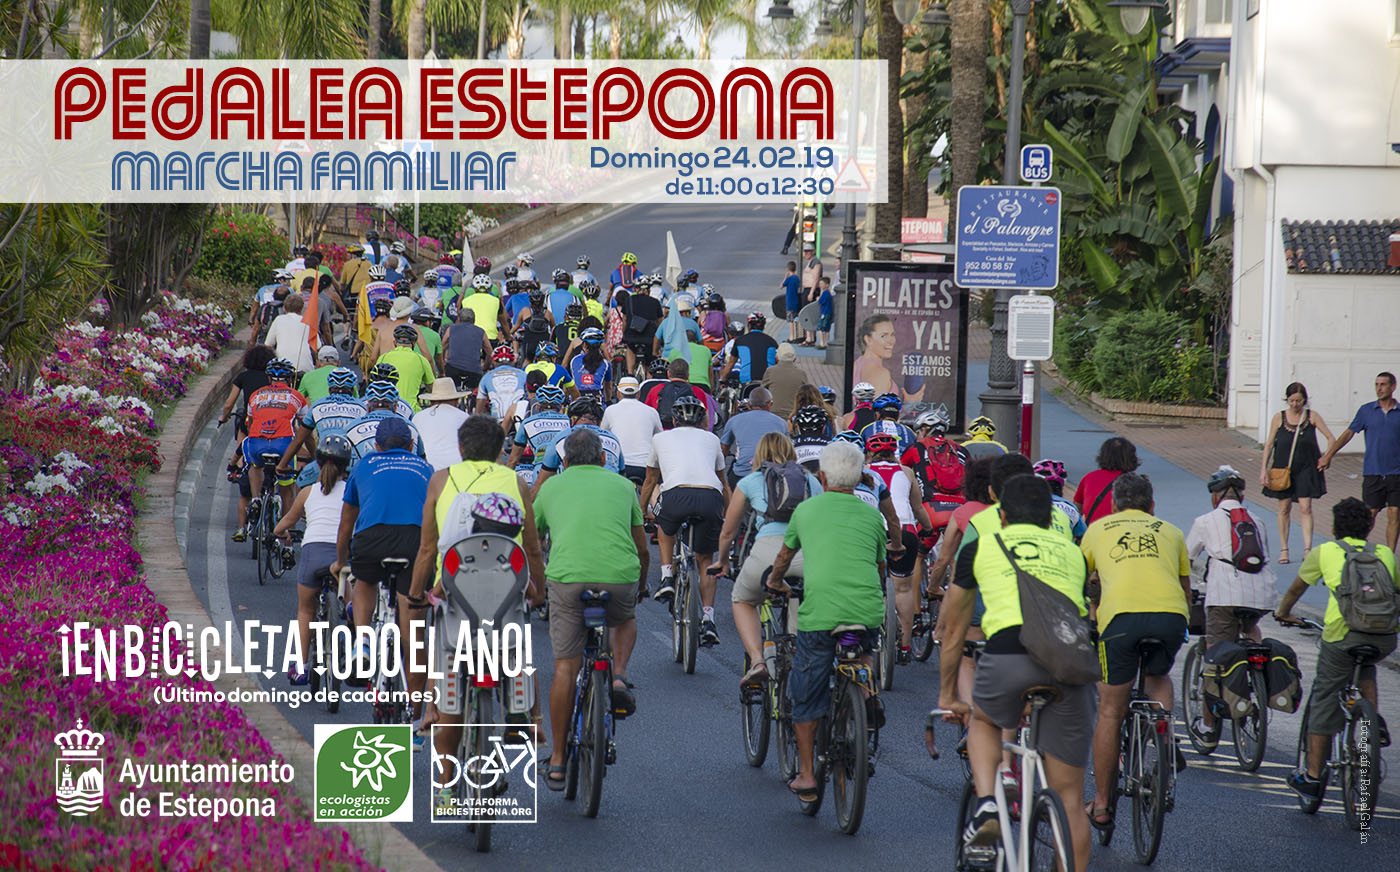 Pedalea Estepona. Marcha ciclista popular. Domingo 24/2/19